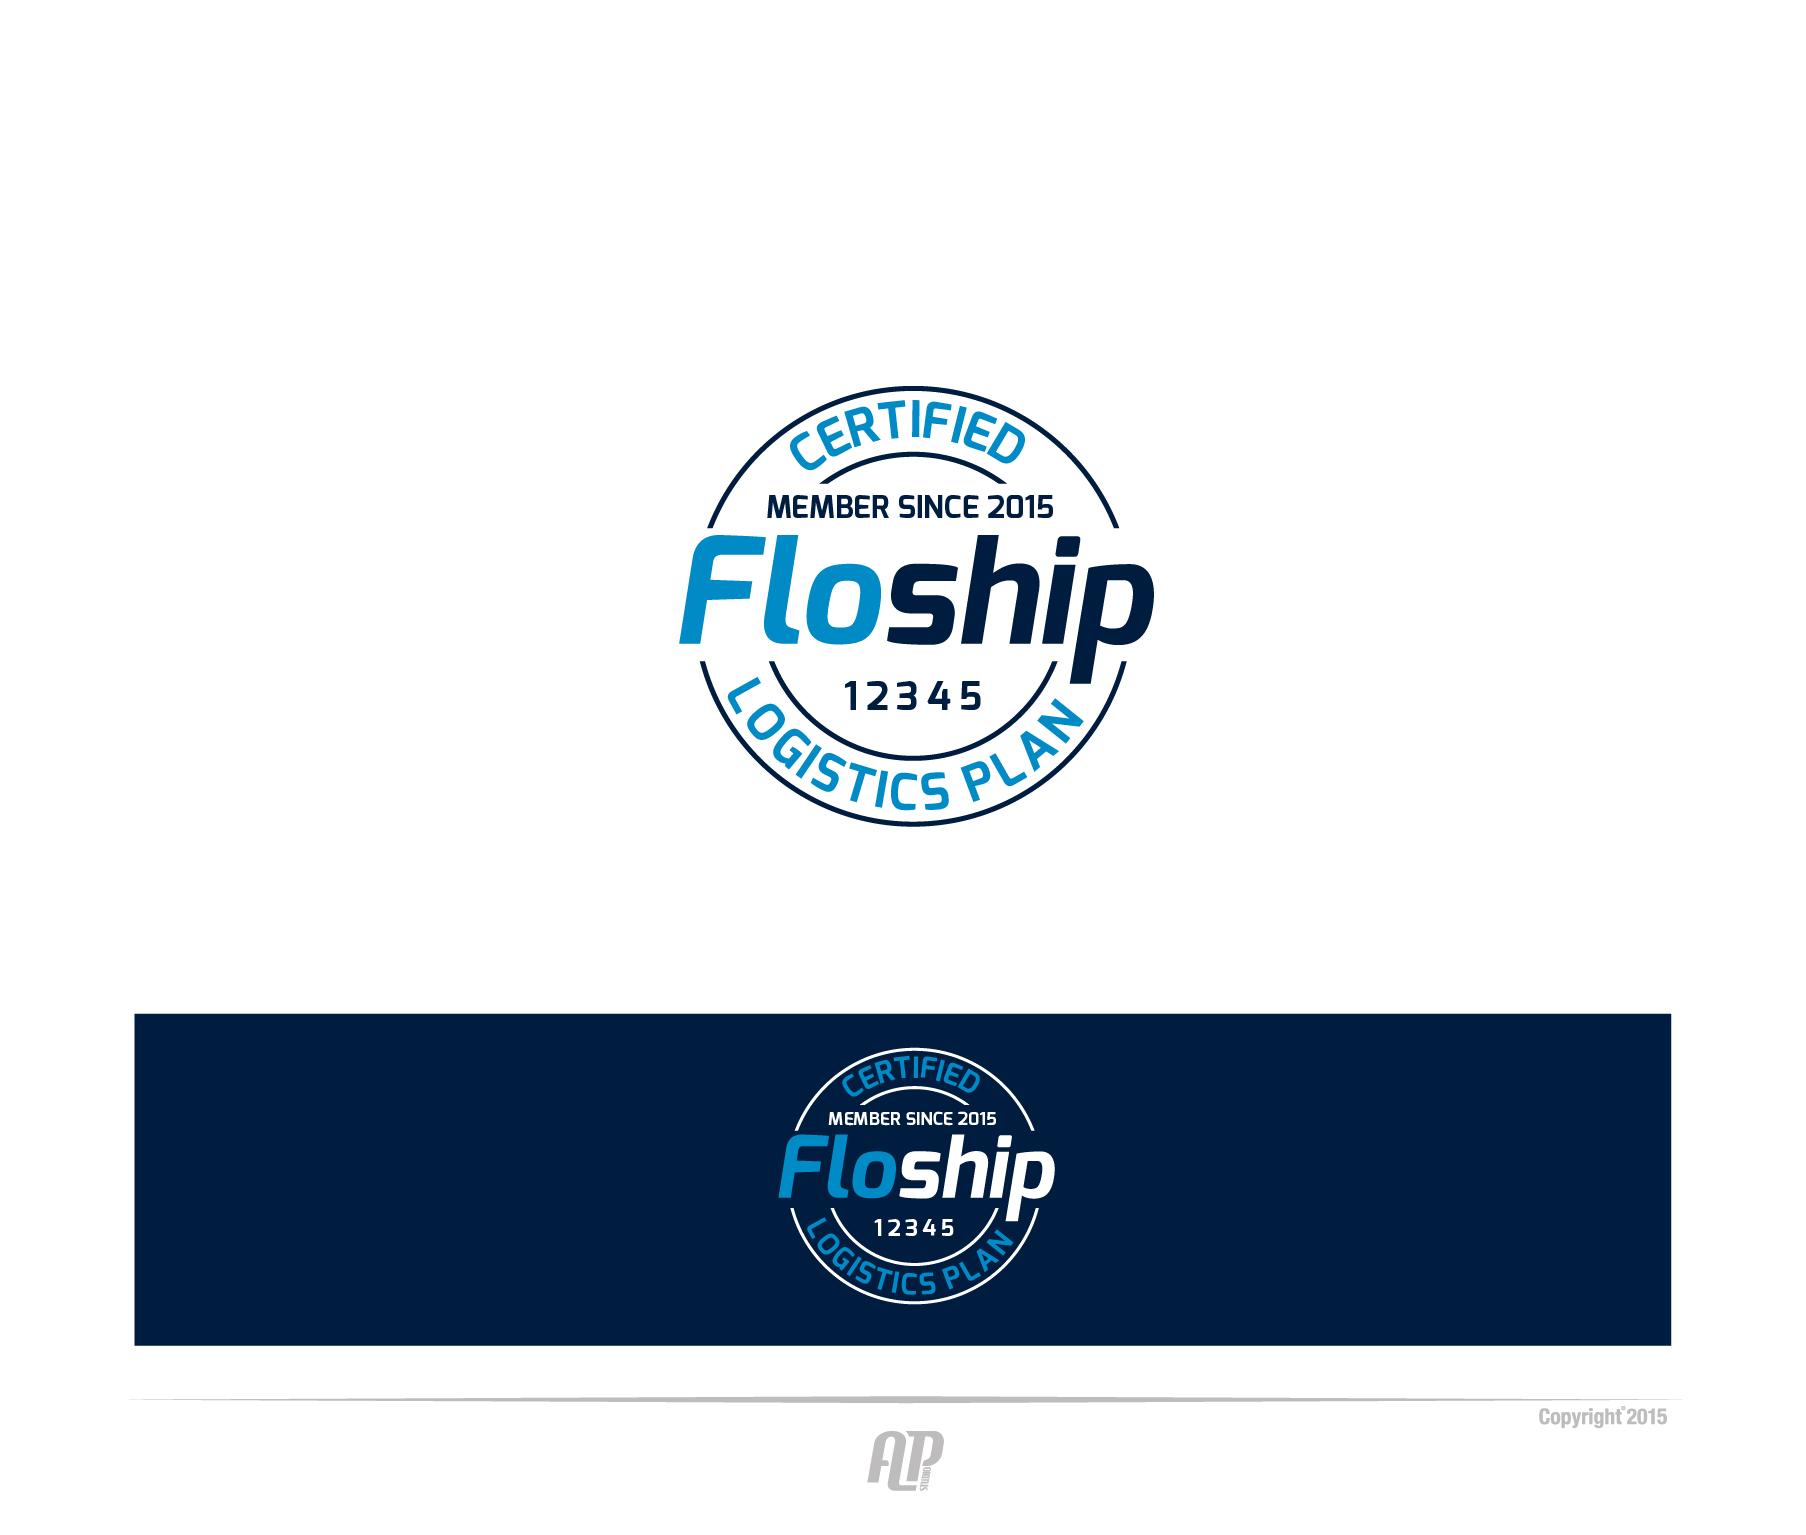 Floship Certified Logistics Plan seal